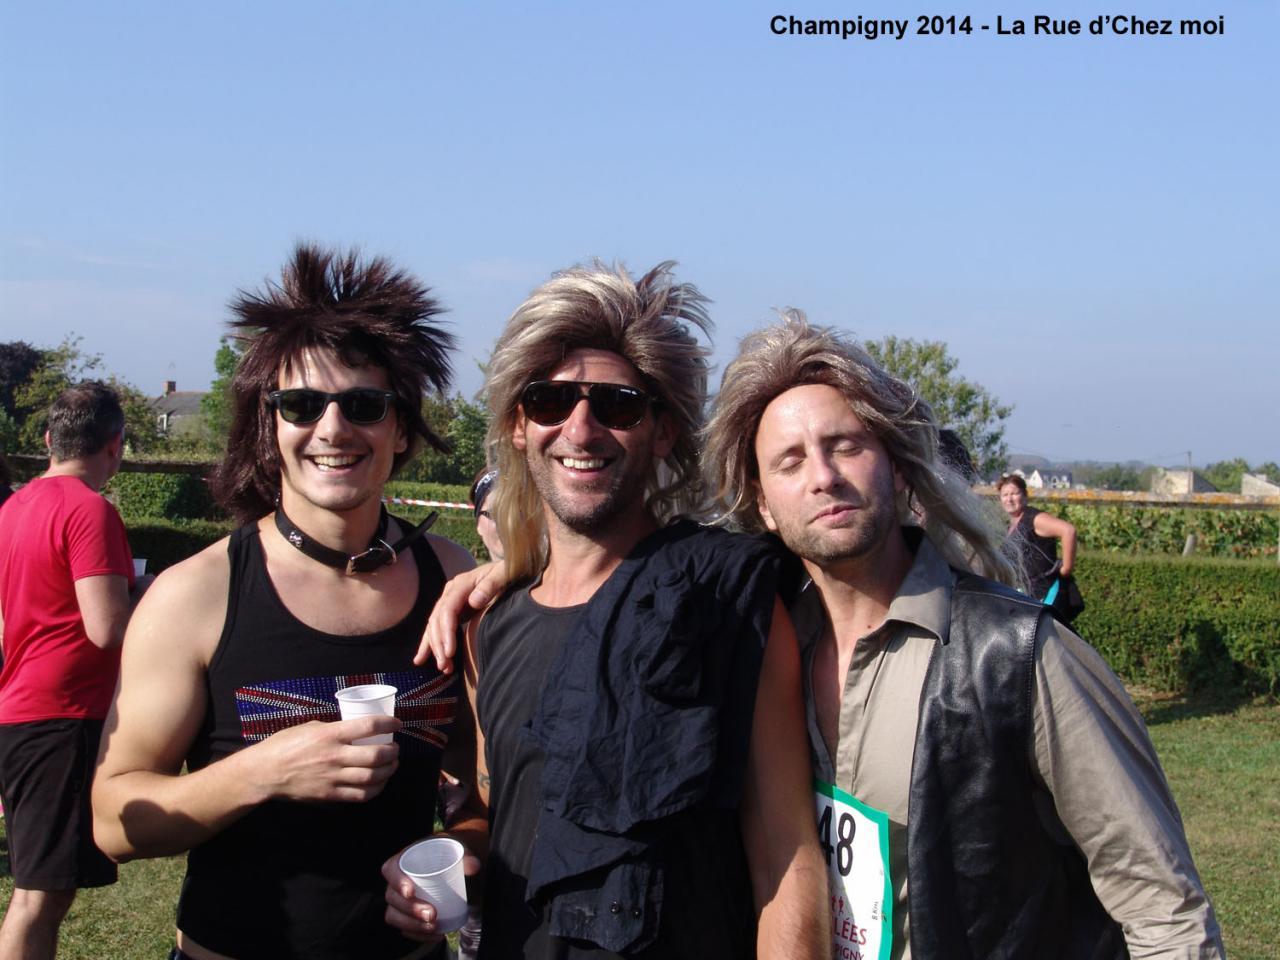 Champigny 2014 - Rue d'Chez Moi (42)